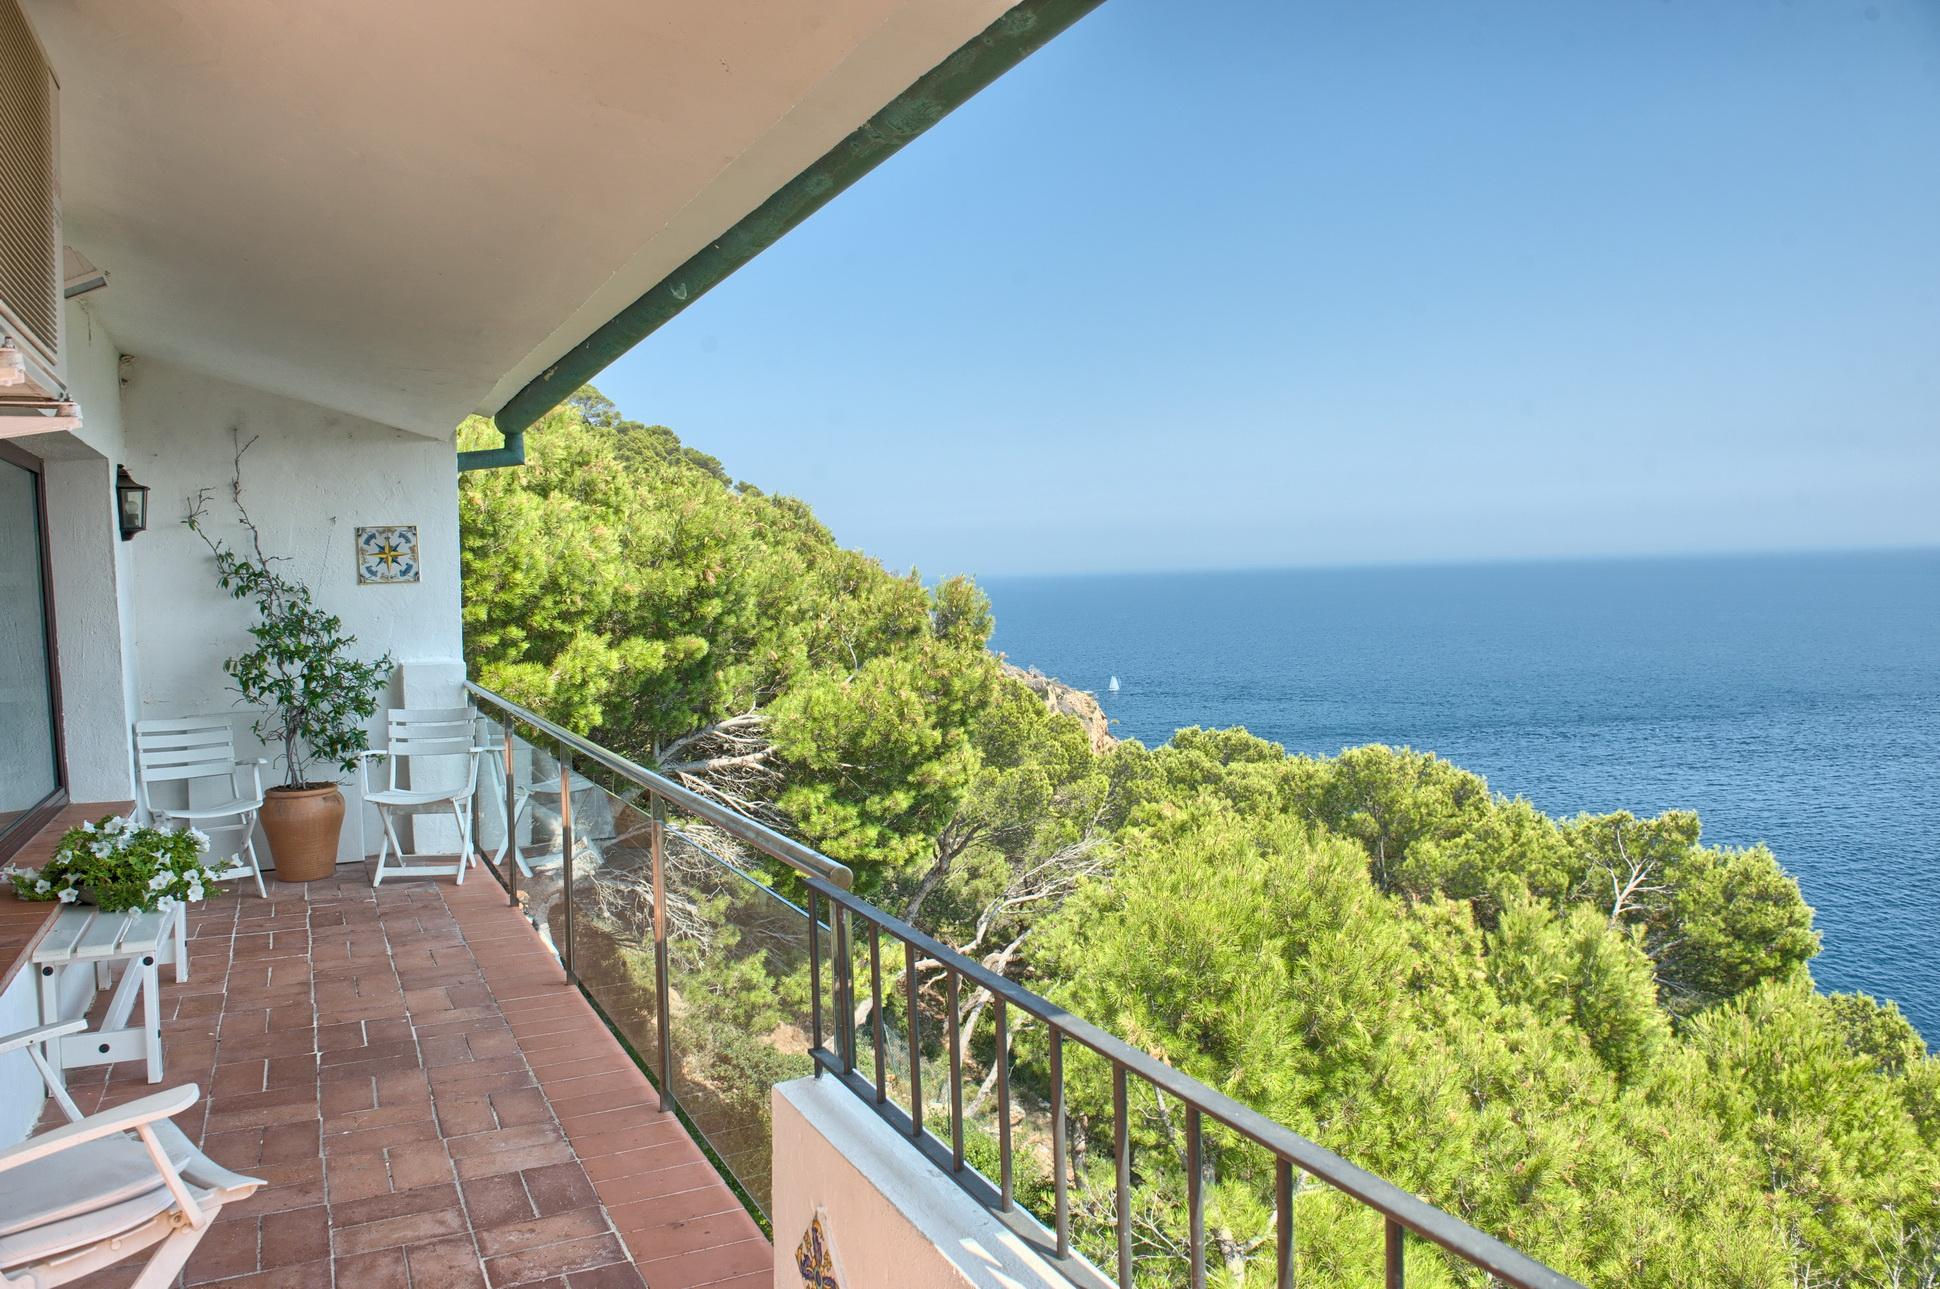 Moradia para Venda às Charming sea front villa with unique views Begur, Costa Brava, 17255 Espanha